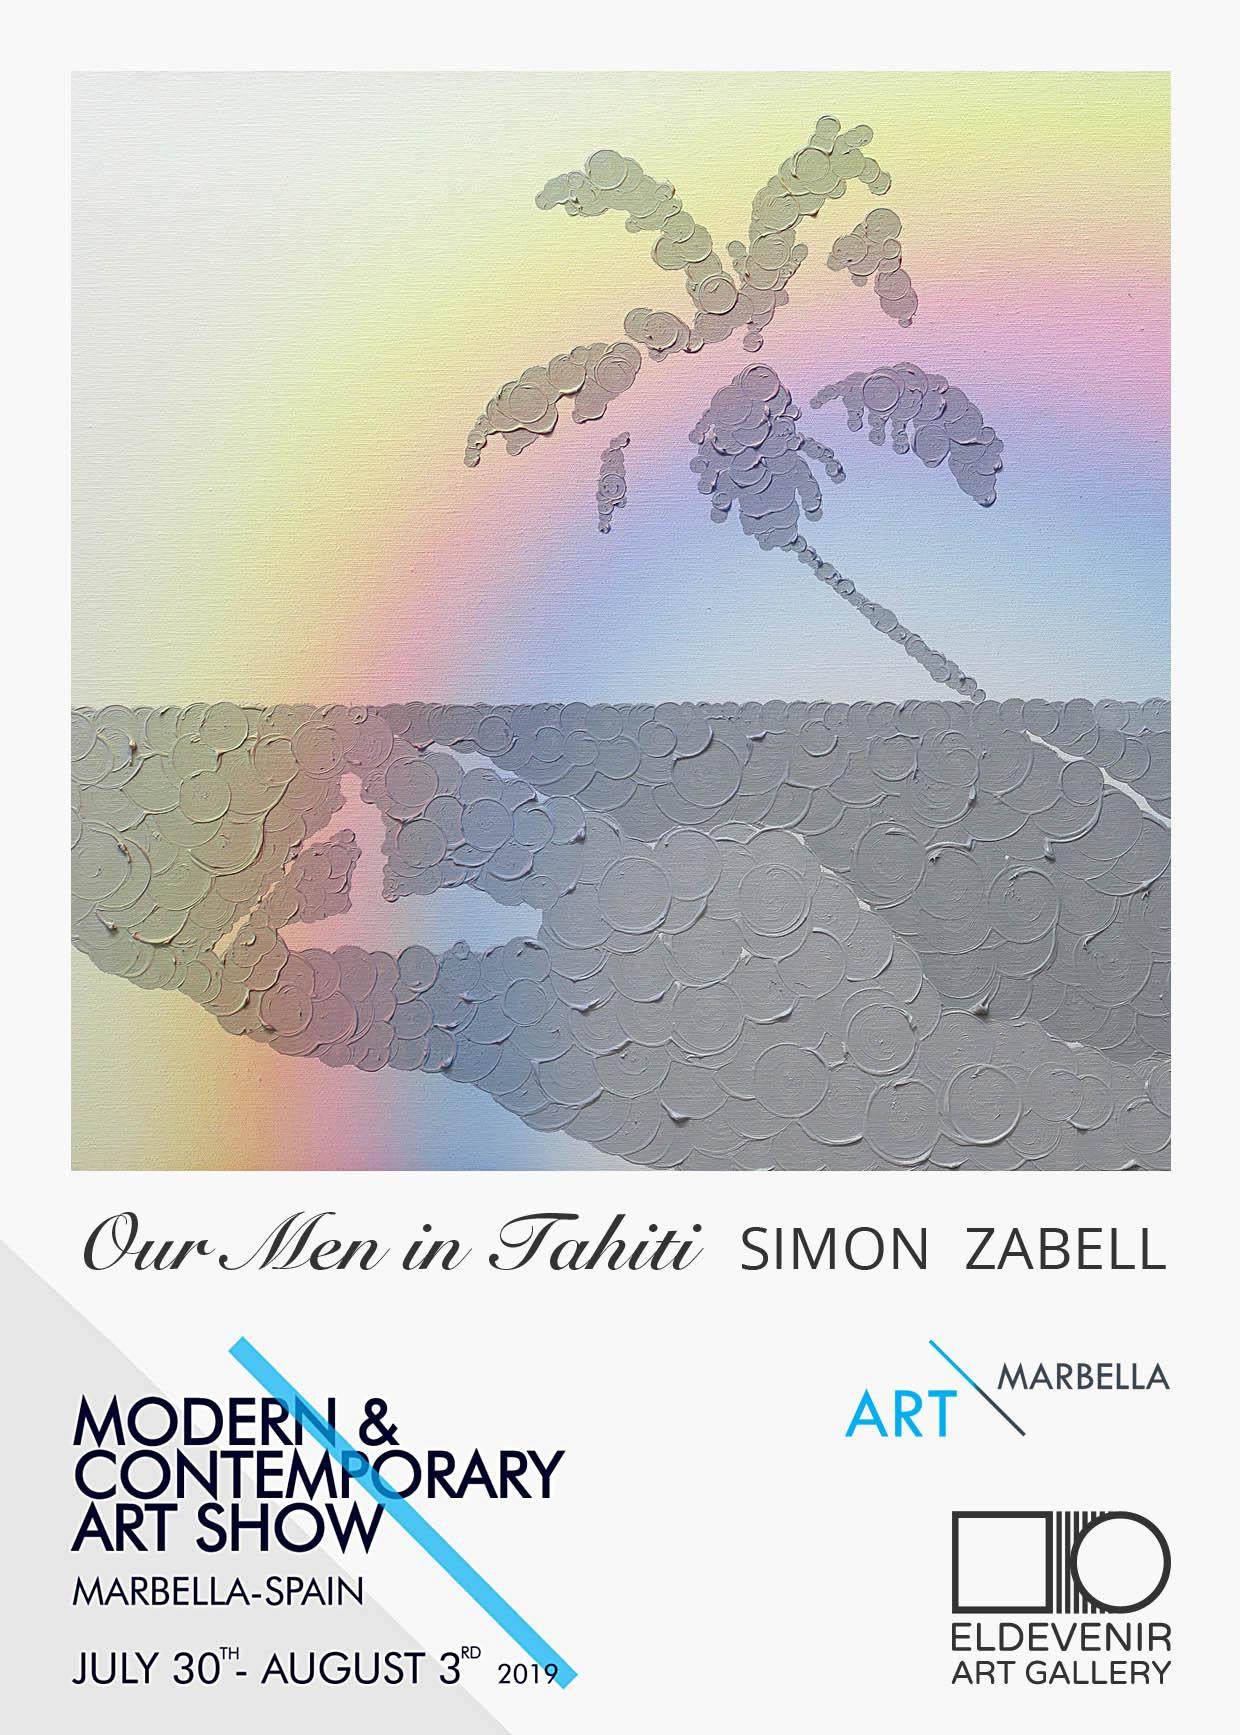 Postal-artmarbella2019-simon-zabell-eldevenir-art-gallery-malaga-galeria-arte-contemporaneo-coleccionismo-nerja-axarquia-torrox-maria-rosa-jurado.jpg